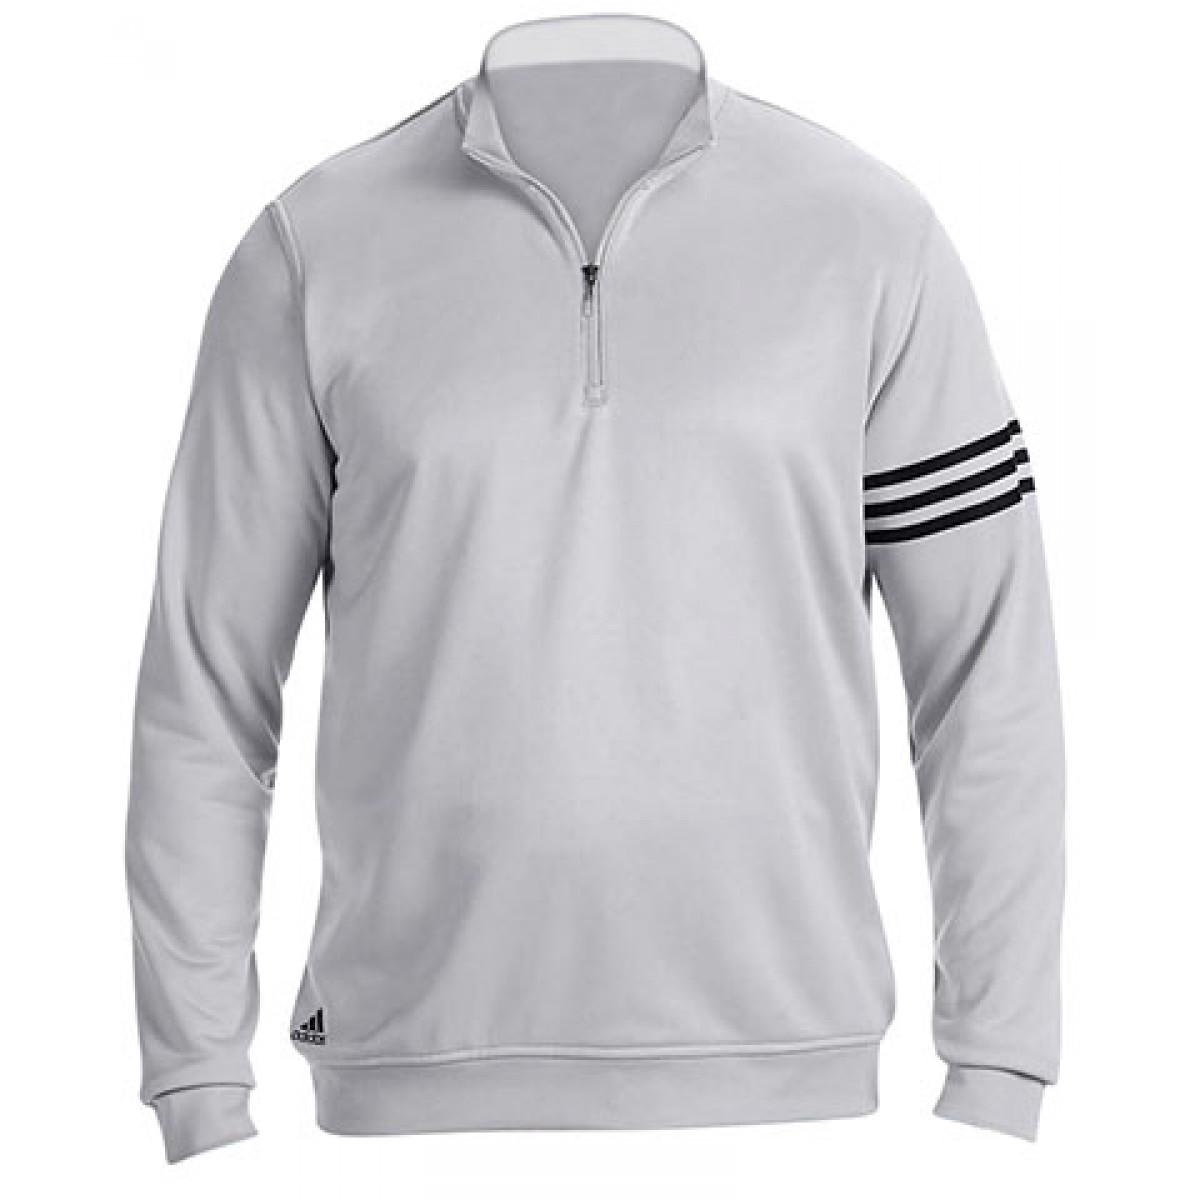 Adidas Men's 3-Stripes Pullover-Gray -M